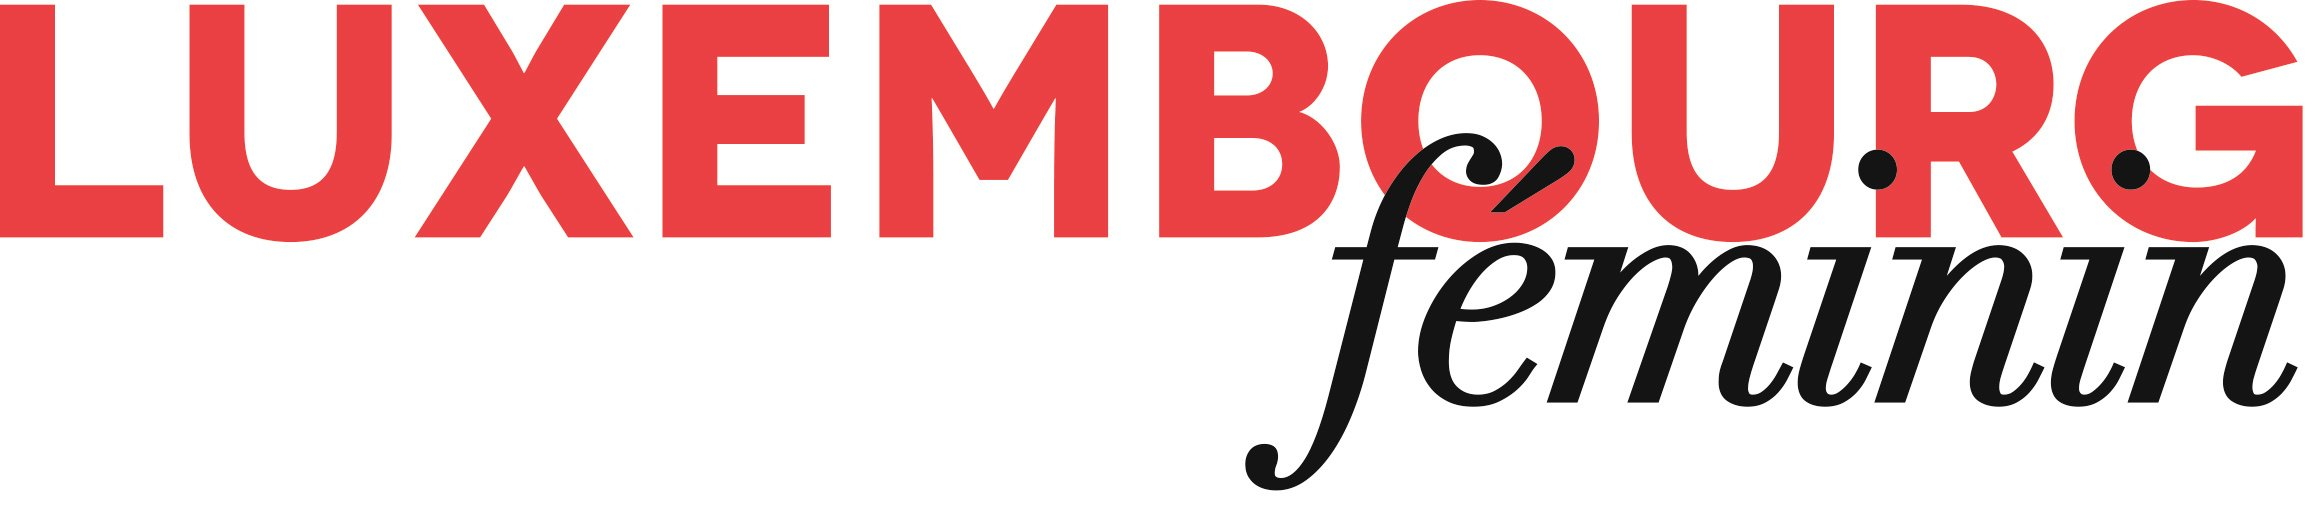 Logo Luxembourg féminin pour Amatera